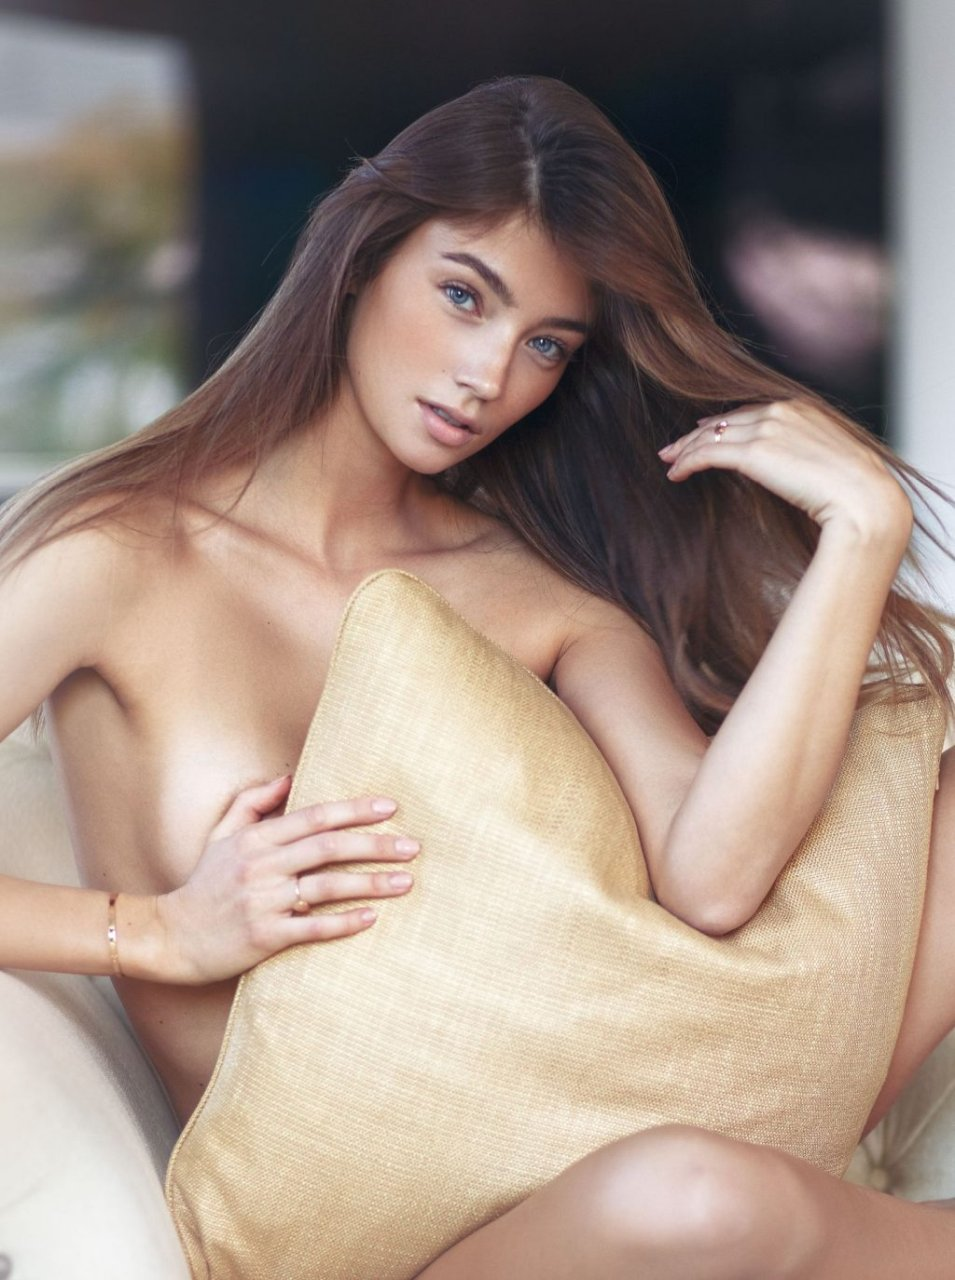 Lorena Rae Sexy & Topless (17 Photos)